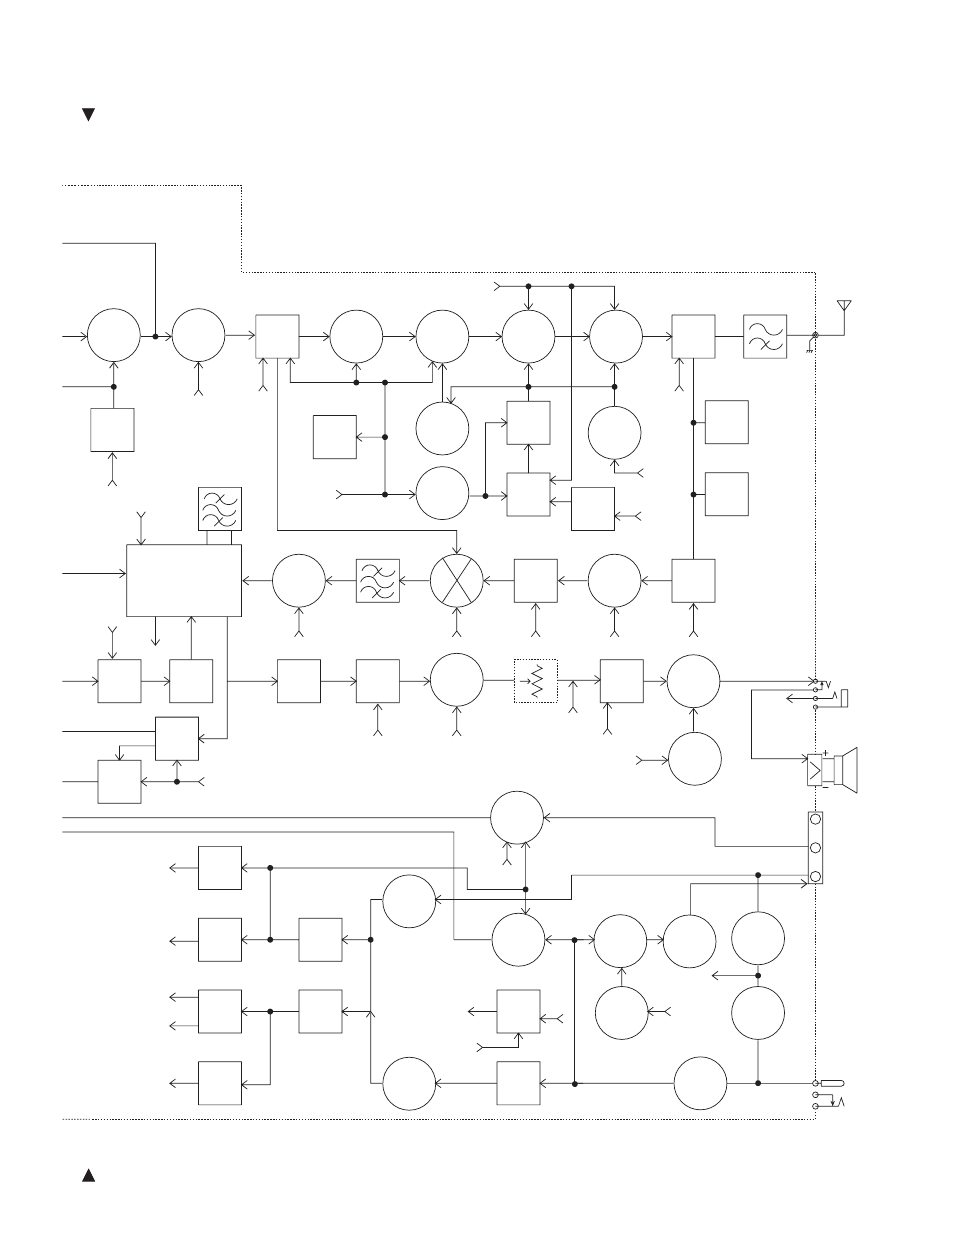 medium resolution of th k2at k2e k2et block diagram kenwood 144mhz fm transceiver k2e user manual page 60 63